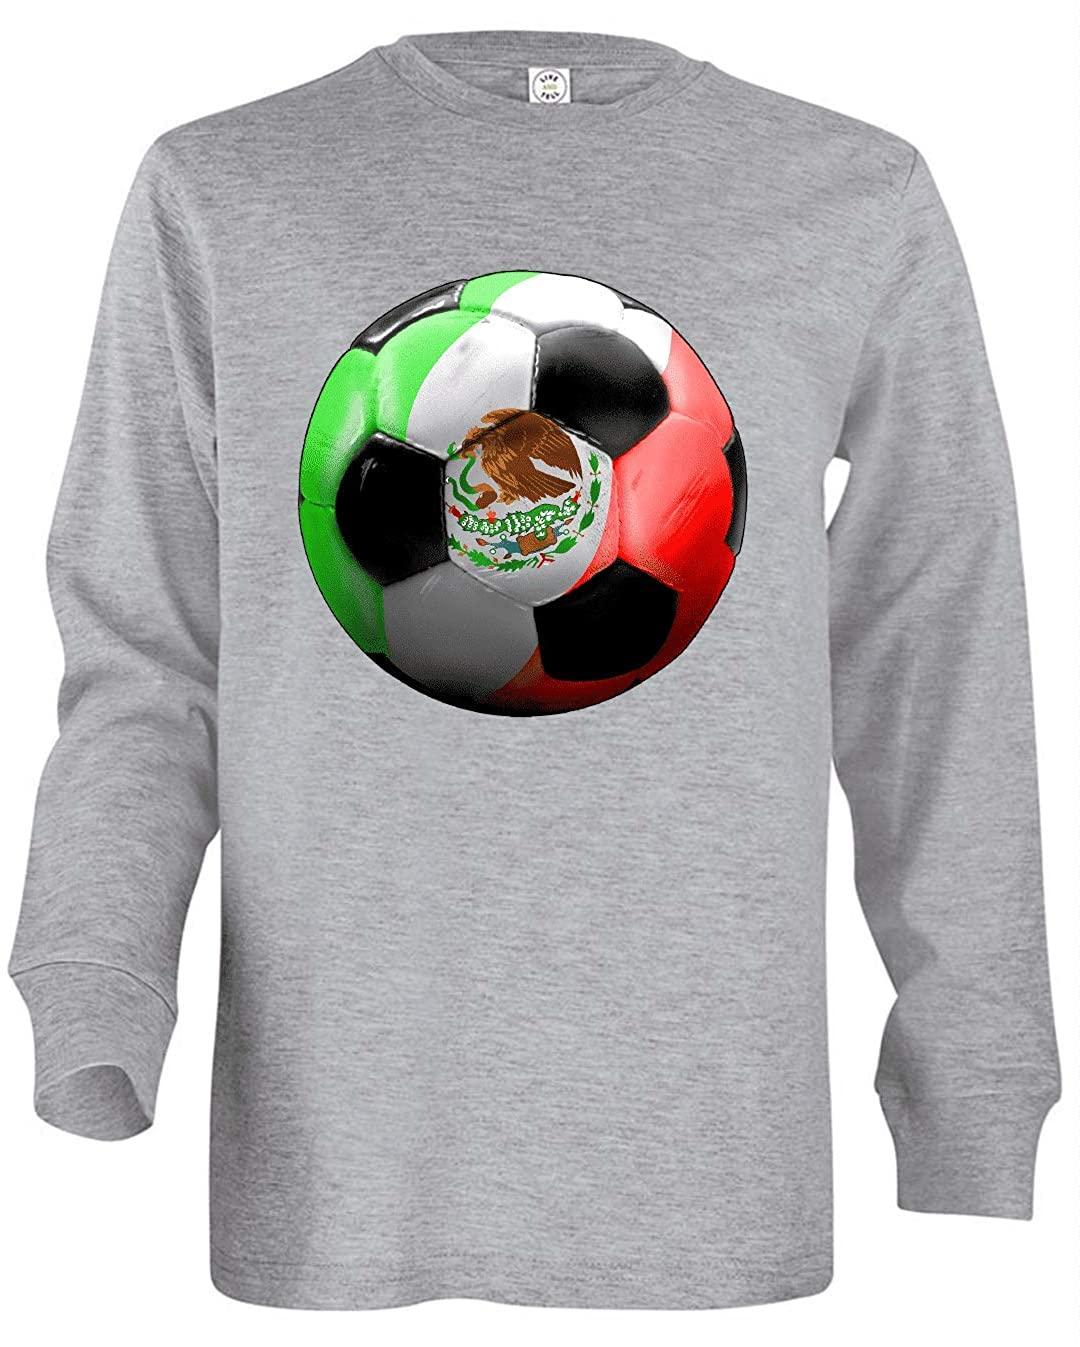 HARD EDGE DESIGN Girl's Youth Mexico Soccer Long Sleeve T-Shirt, Large, Heather Grey